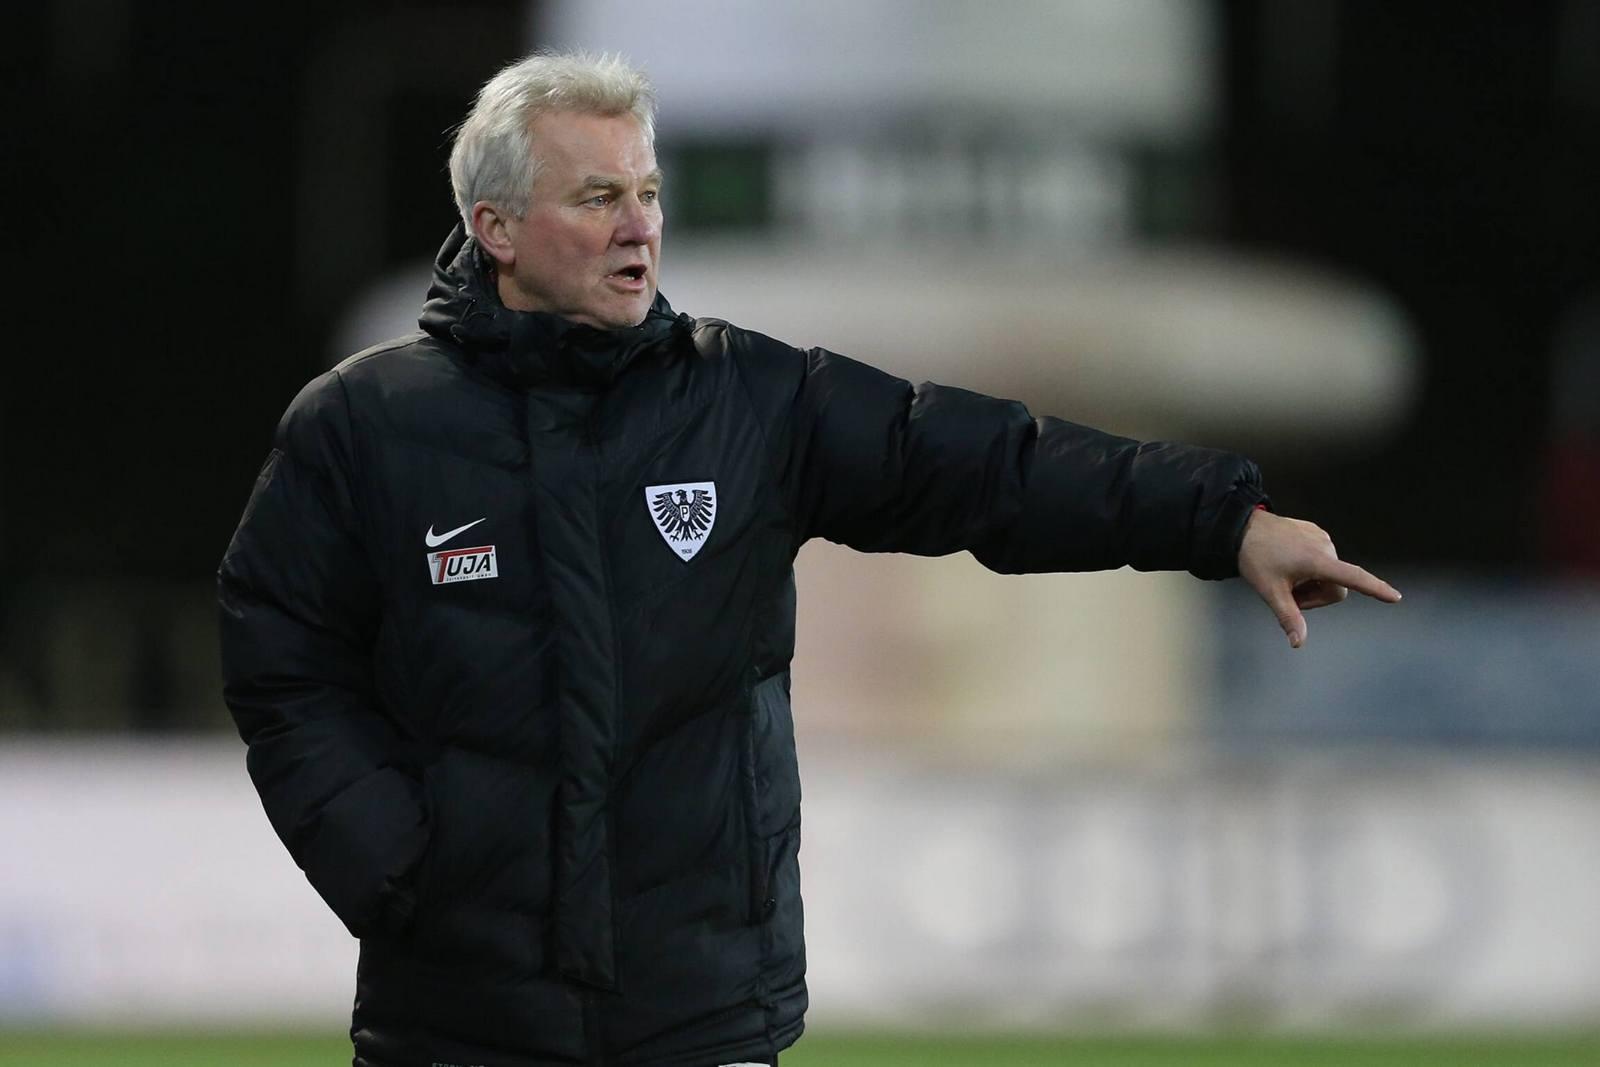 Wegen Sturmflaute besorgt: Münsters Trainer Benno Möhlmann